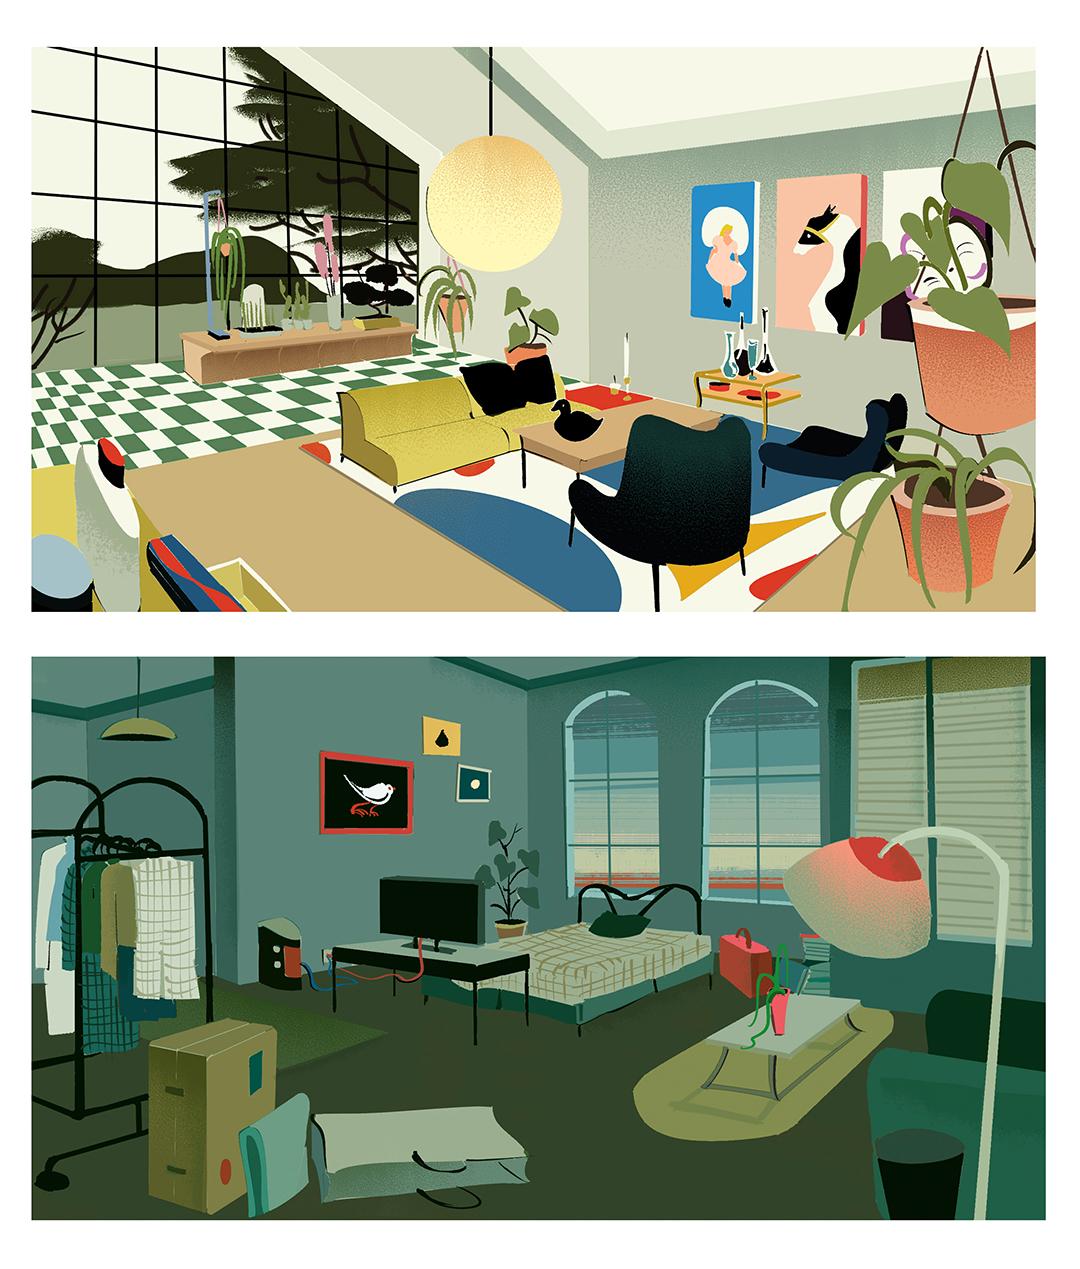 GirlsclubAsia-Illustrator-Eve Liu-file27